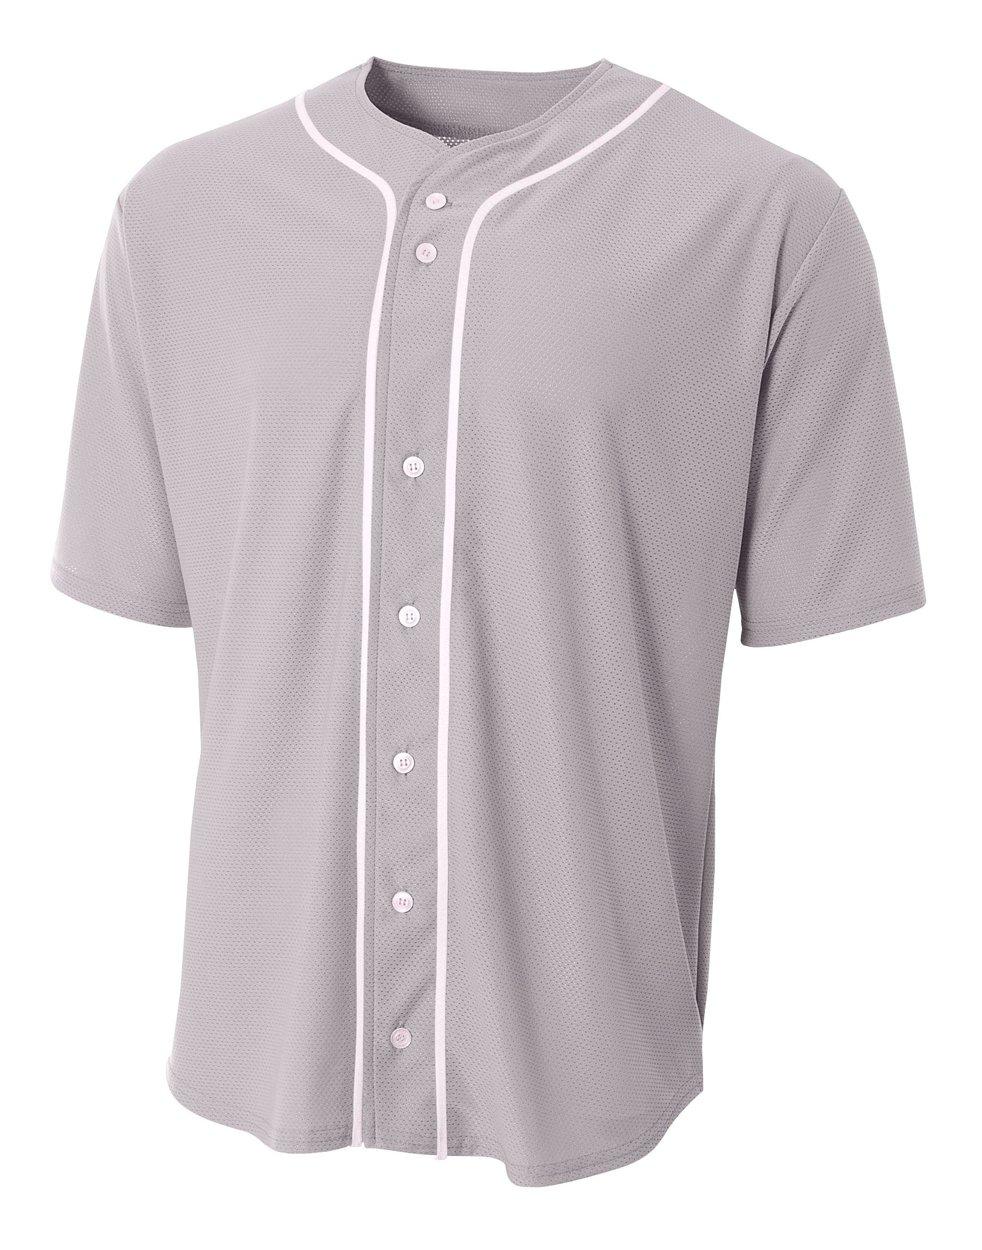 A4 N4184-GRY Shorts Sleeve Full Button Baseball Jersey, Medium, Gray